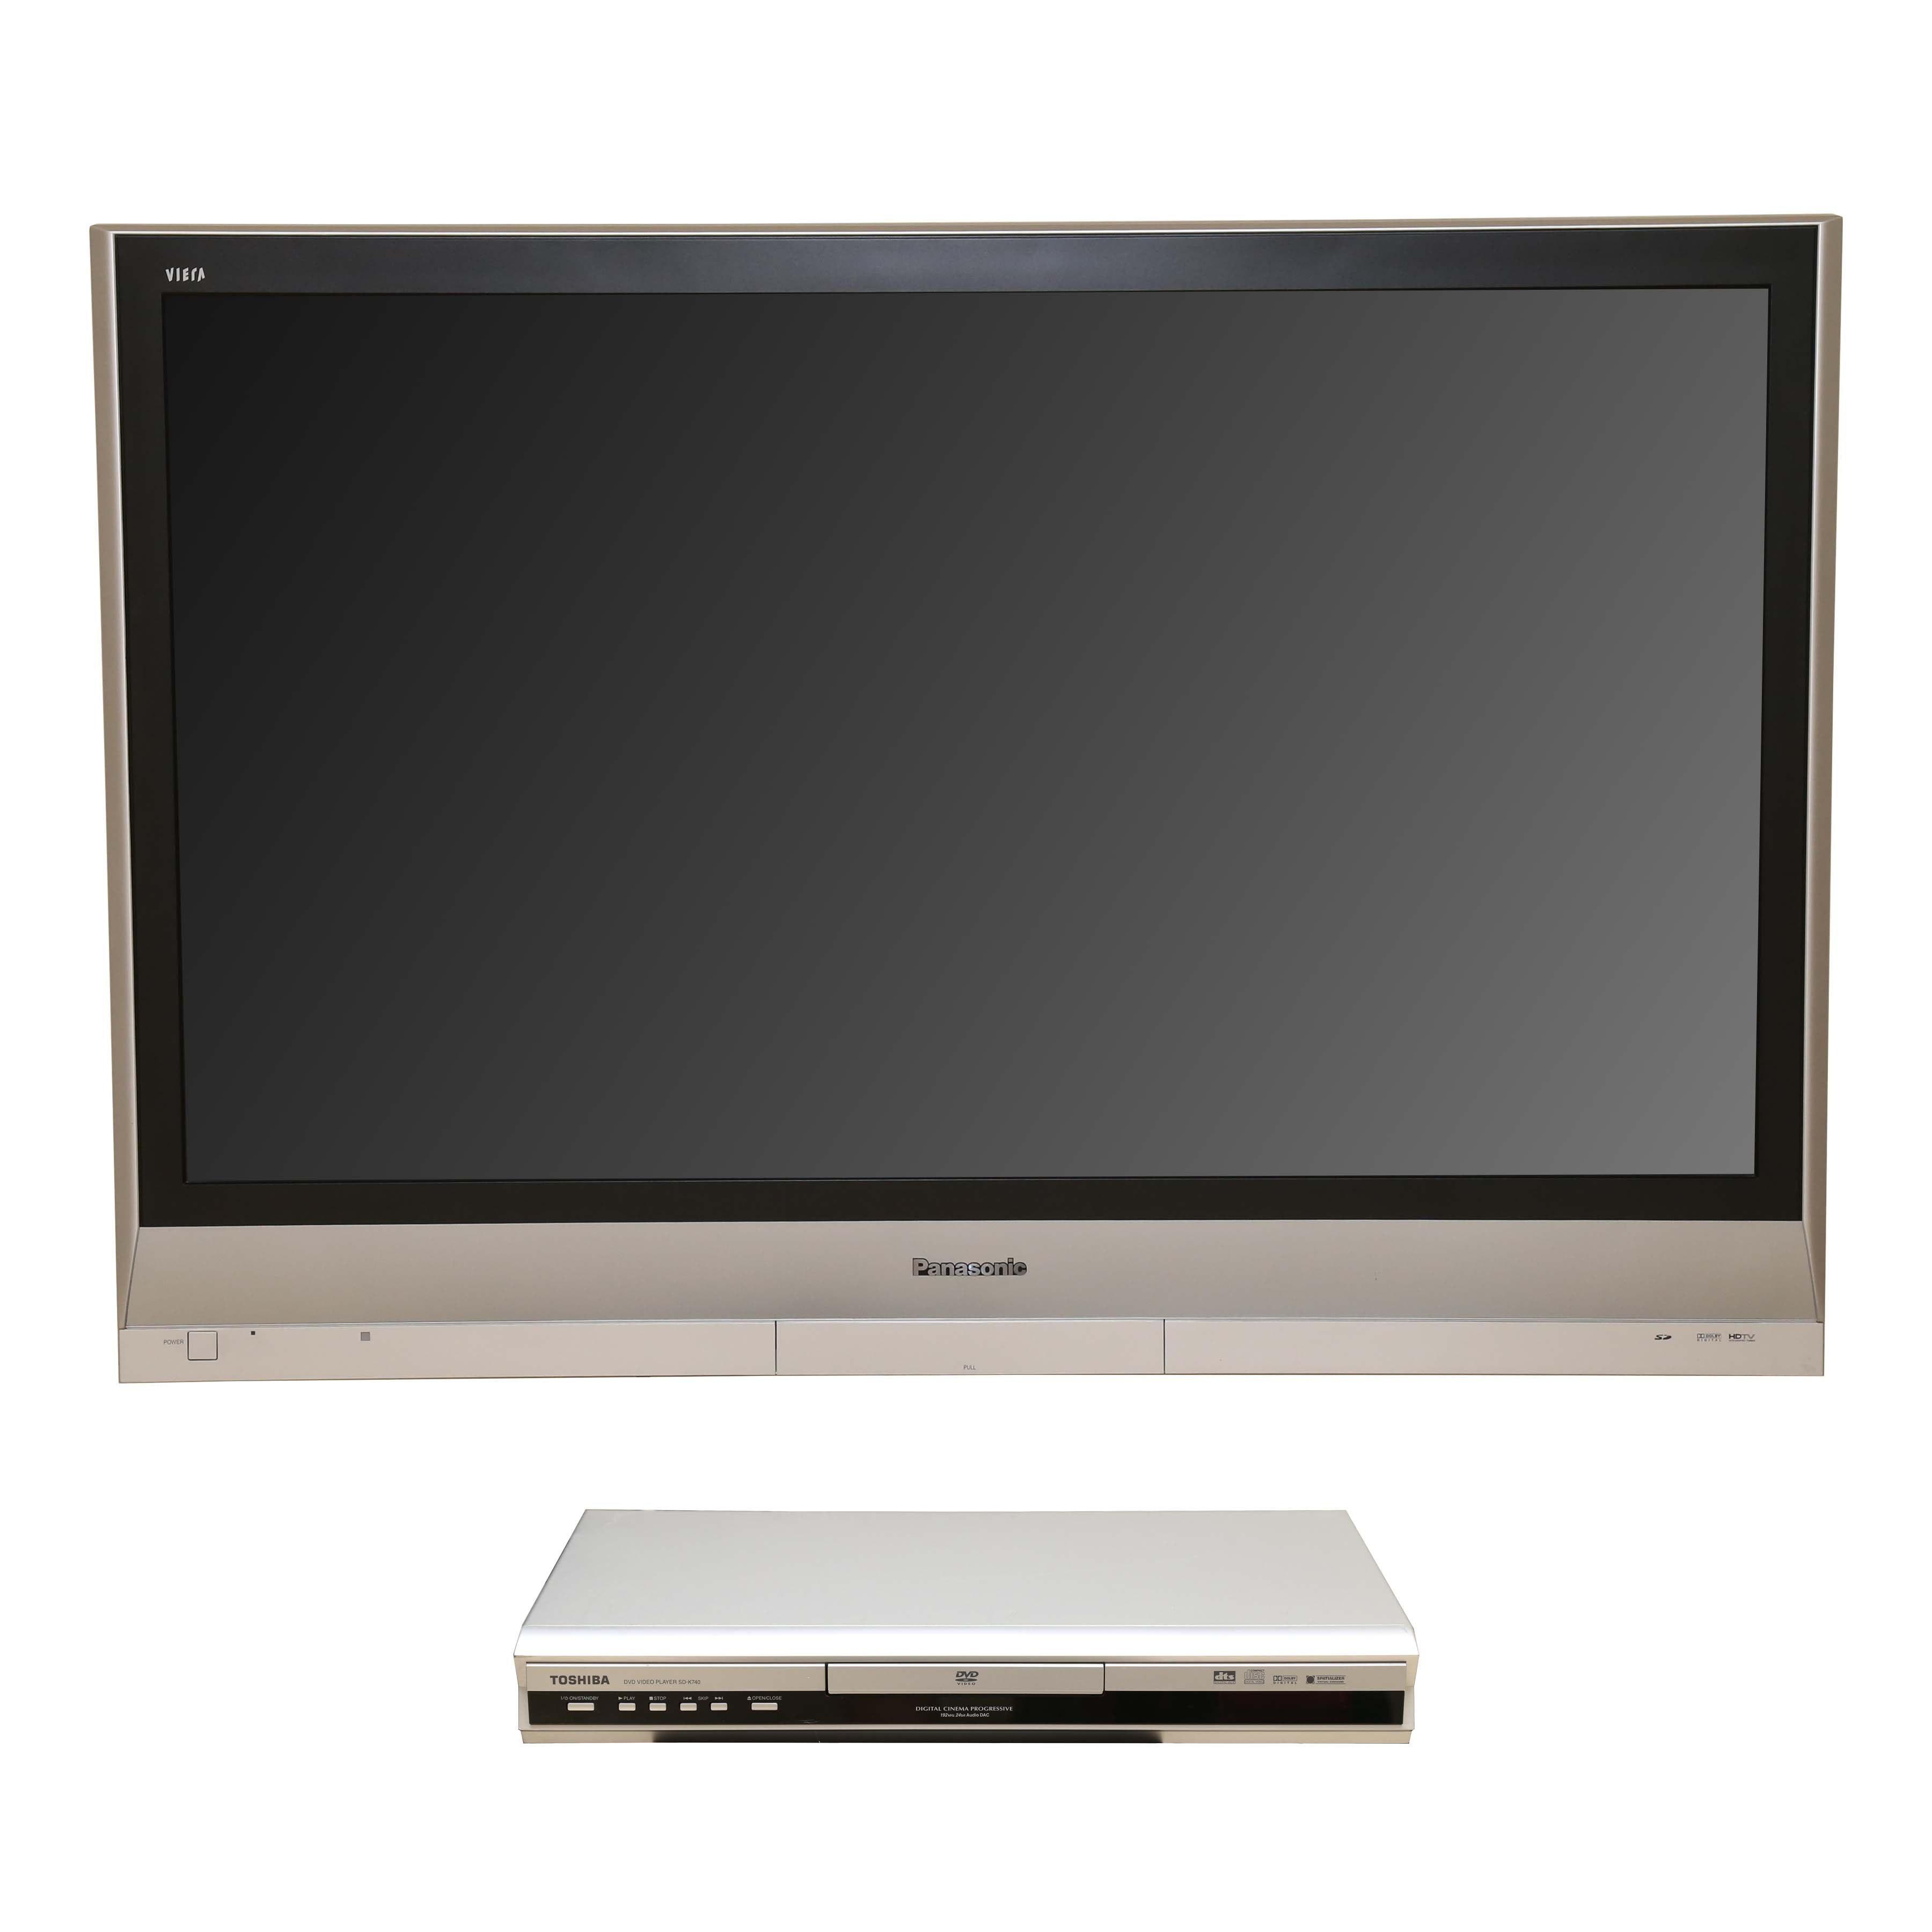 "Panasonic 50"" Television and Toshiba DVD Player"